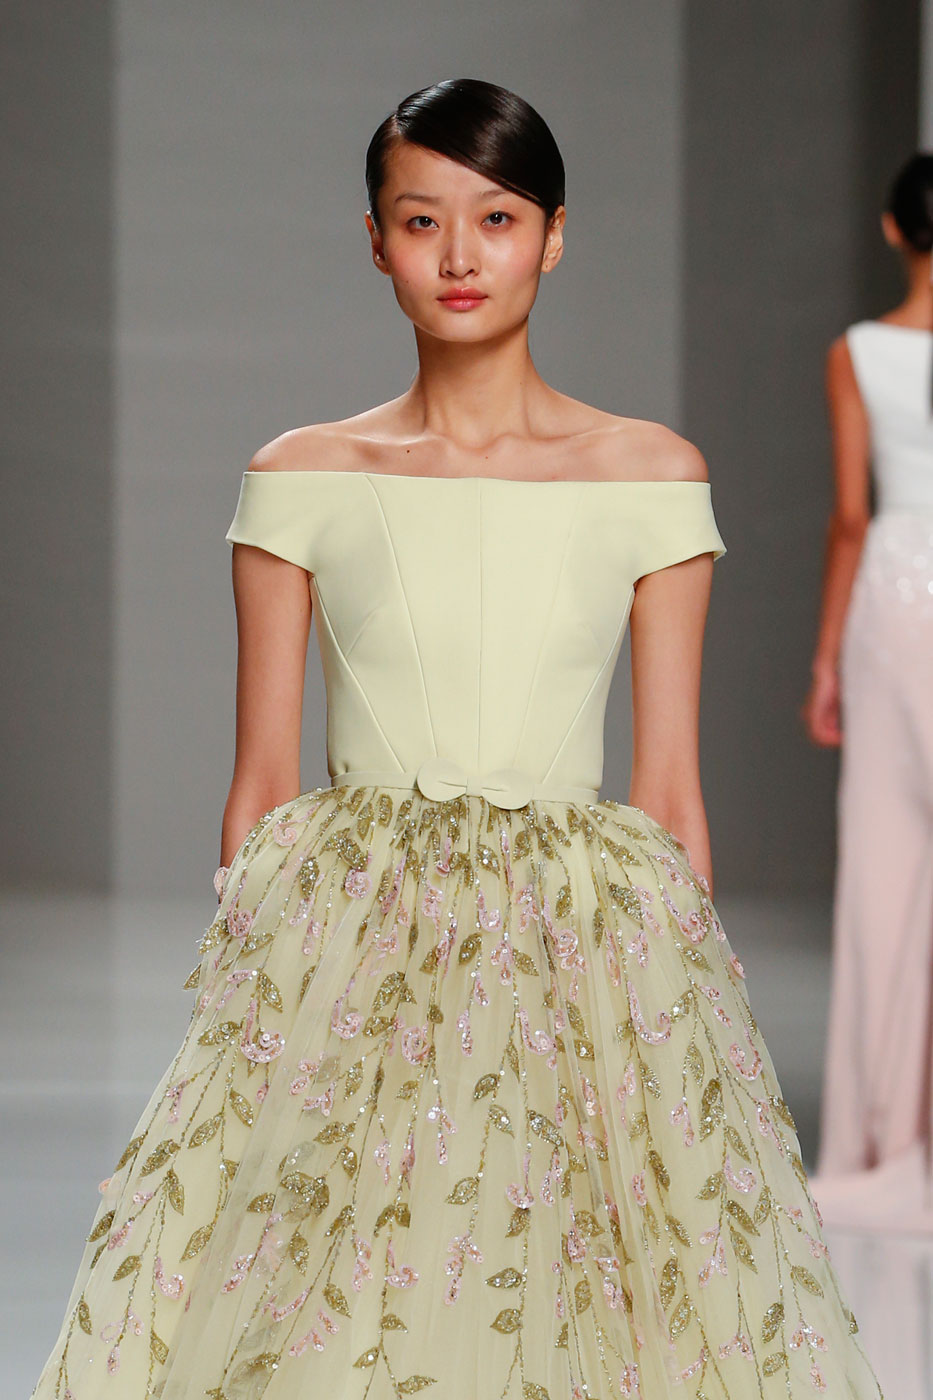 Georges-Hobeika-fashion-runway-show-haute-couture-paris-spring-2015-the-impression-74